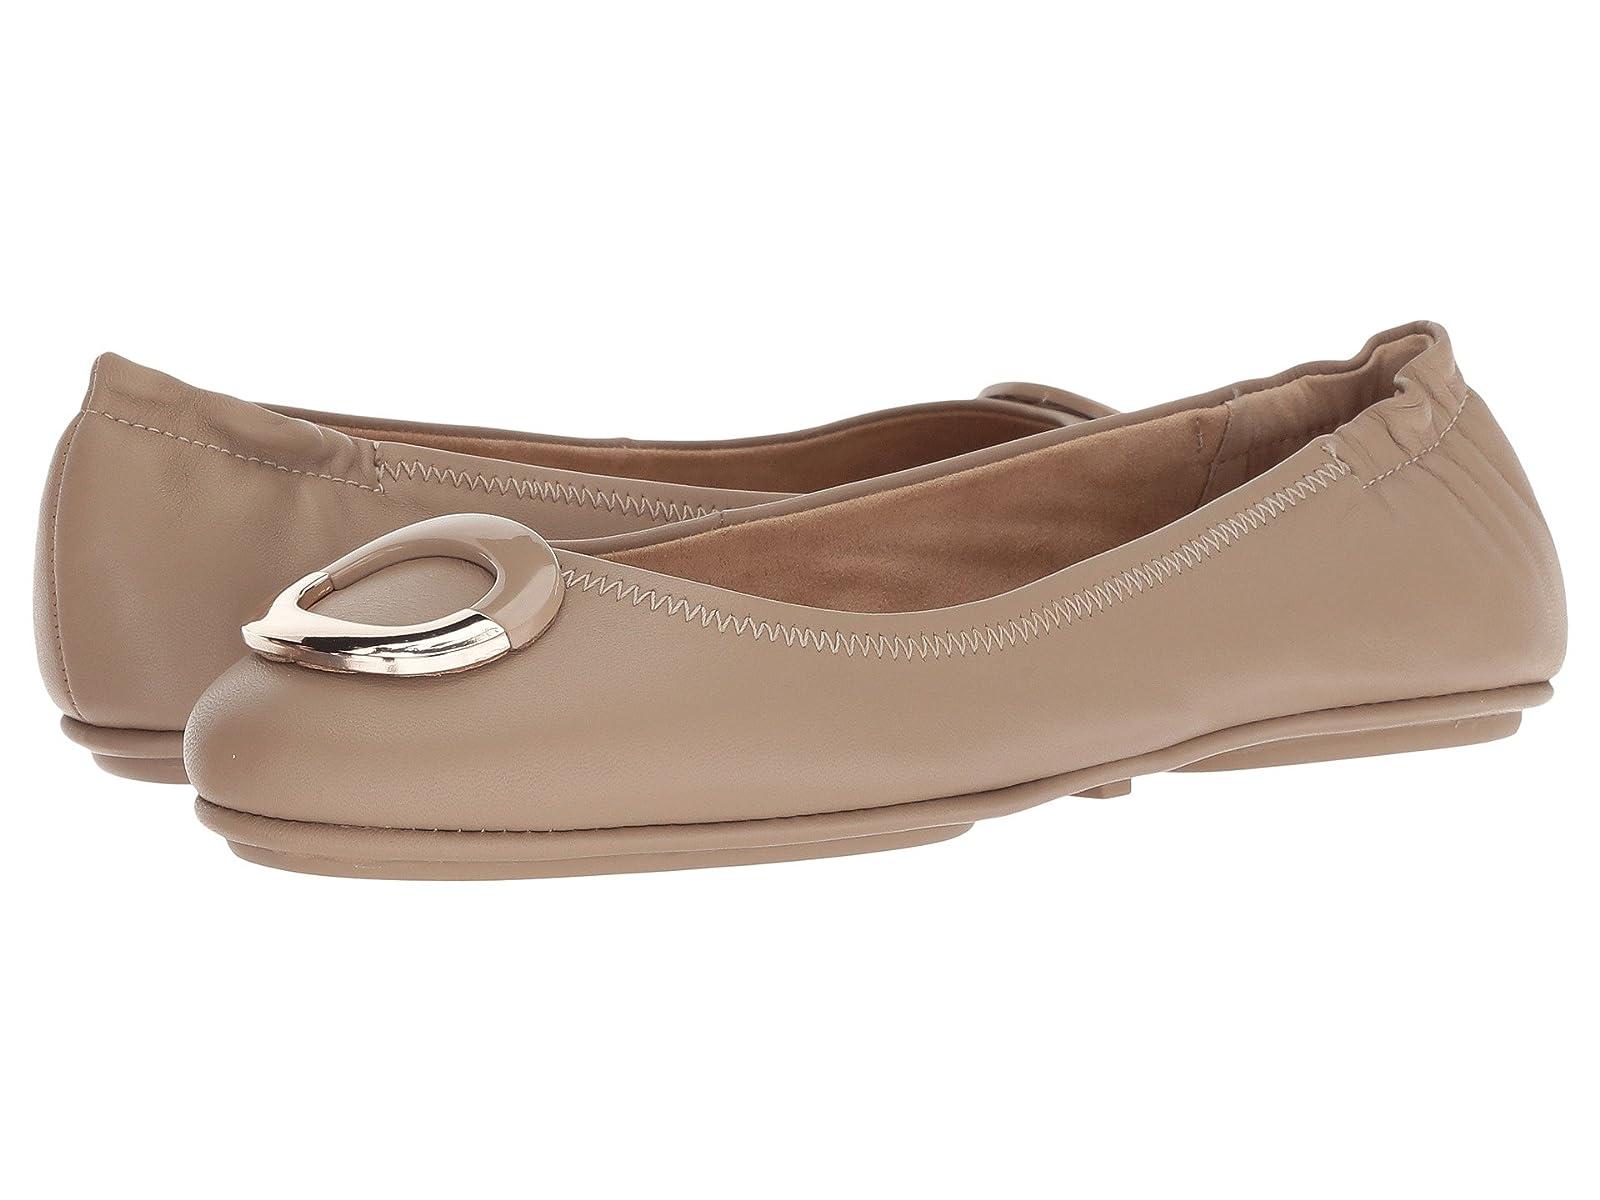 Bandolino FancifulAtmospheric grades have affordable shoes